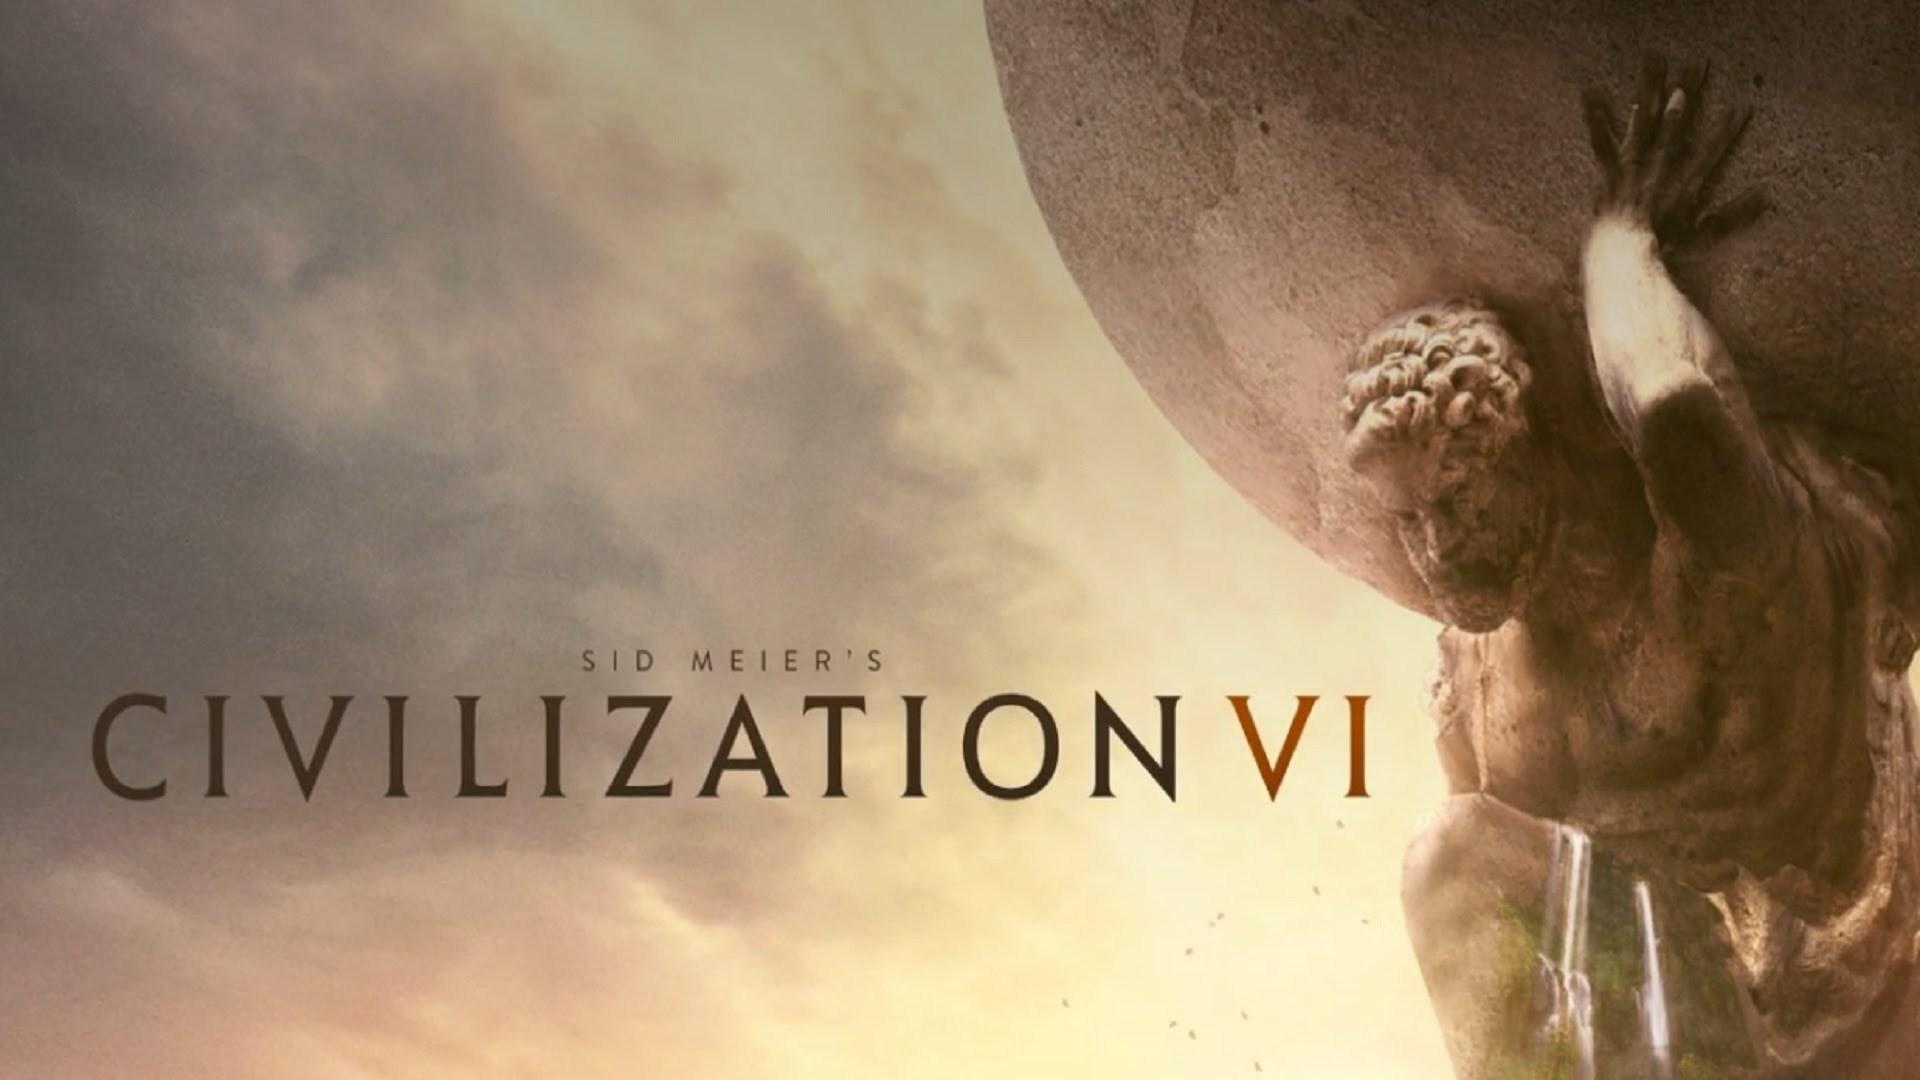 Sid-Meier%E2%80%99s-Civilization-VI-Pict